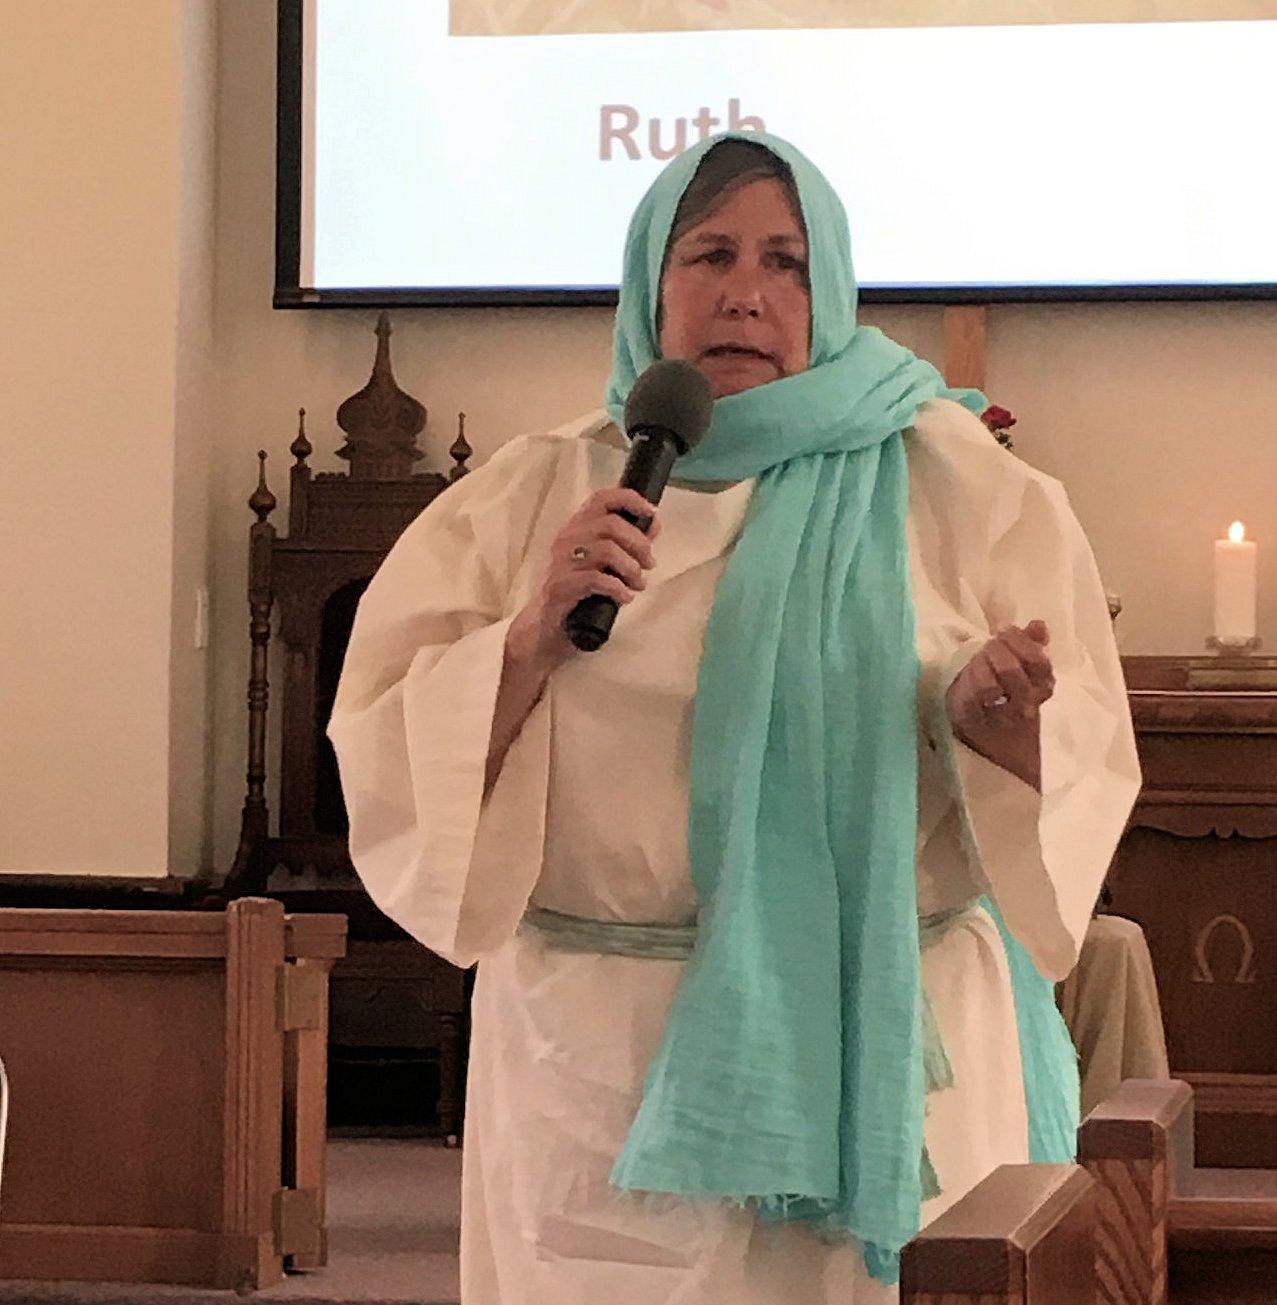 Woman portraying Ruth